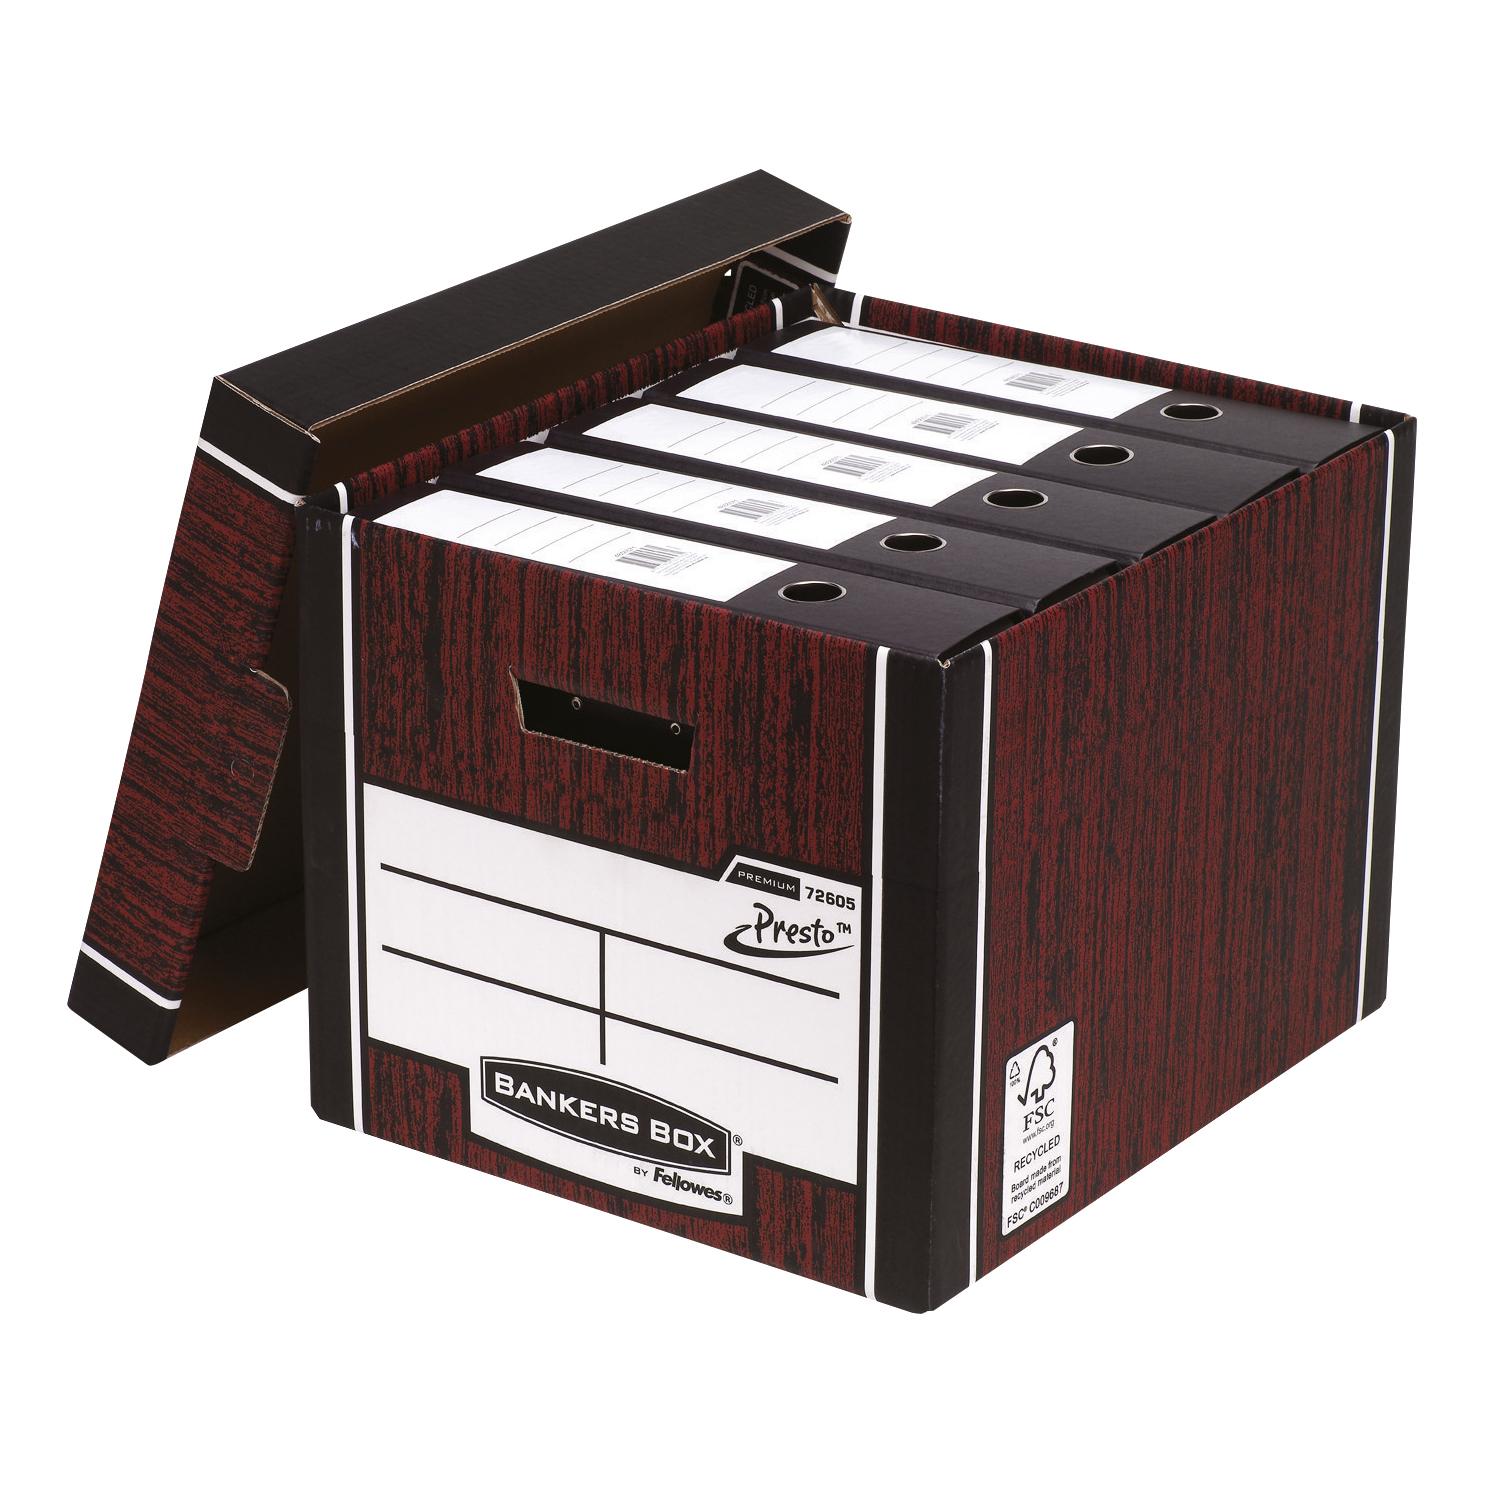 Bankers Box Premium Storage Box Presto Tall Woodgrain FSC Ref 7260503 [Pack 12] [12 for the price of 10]